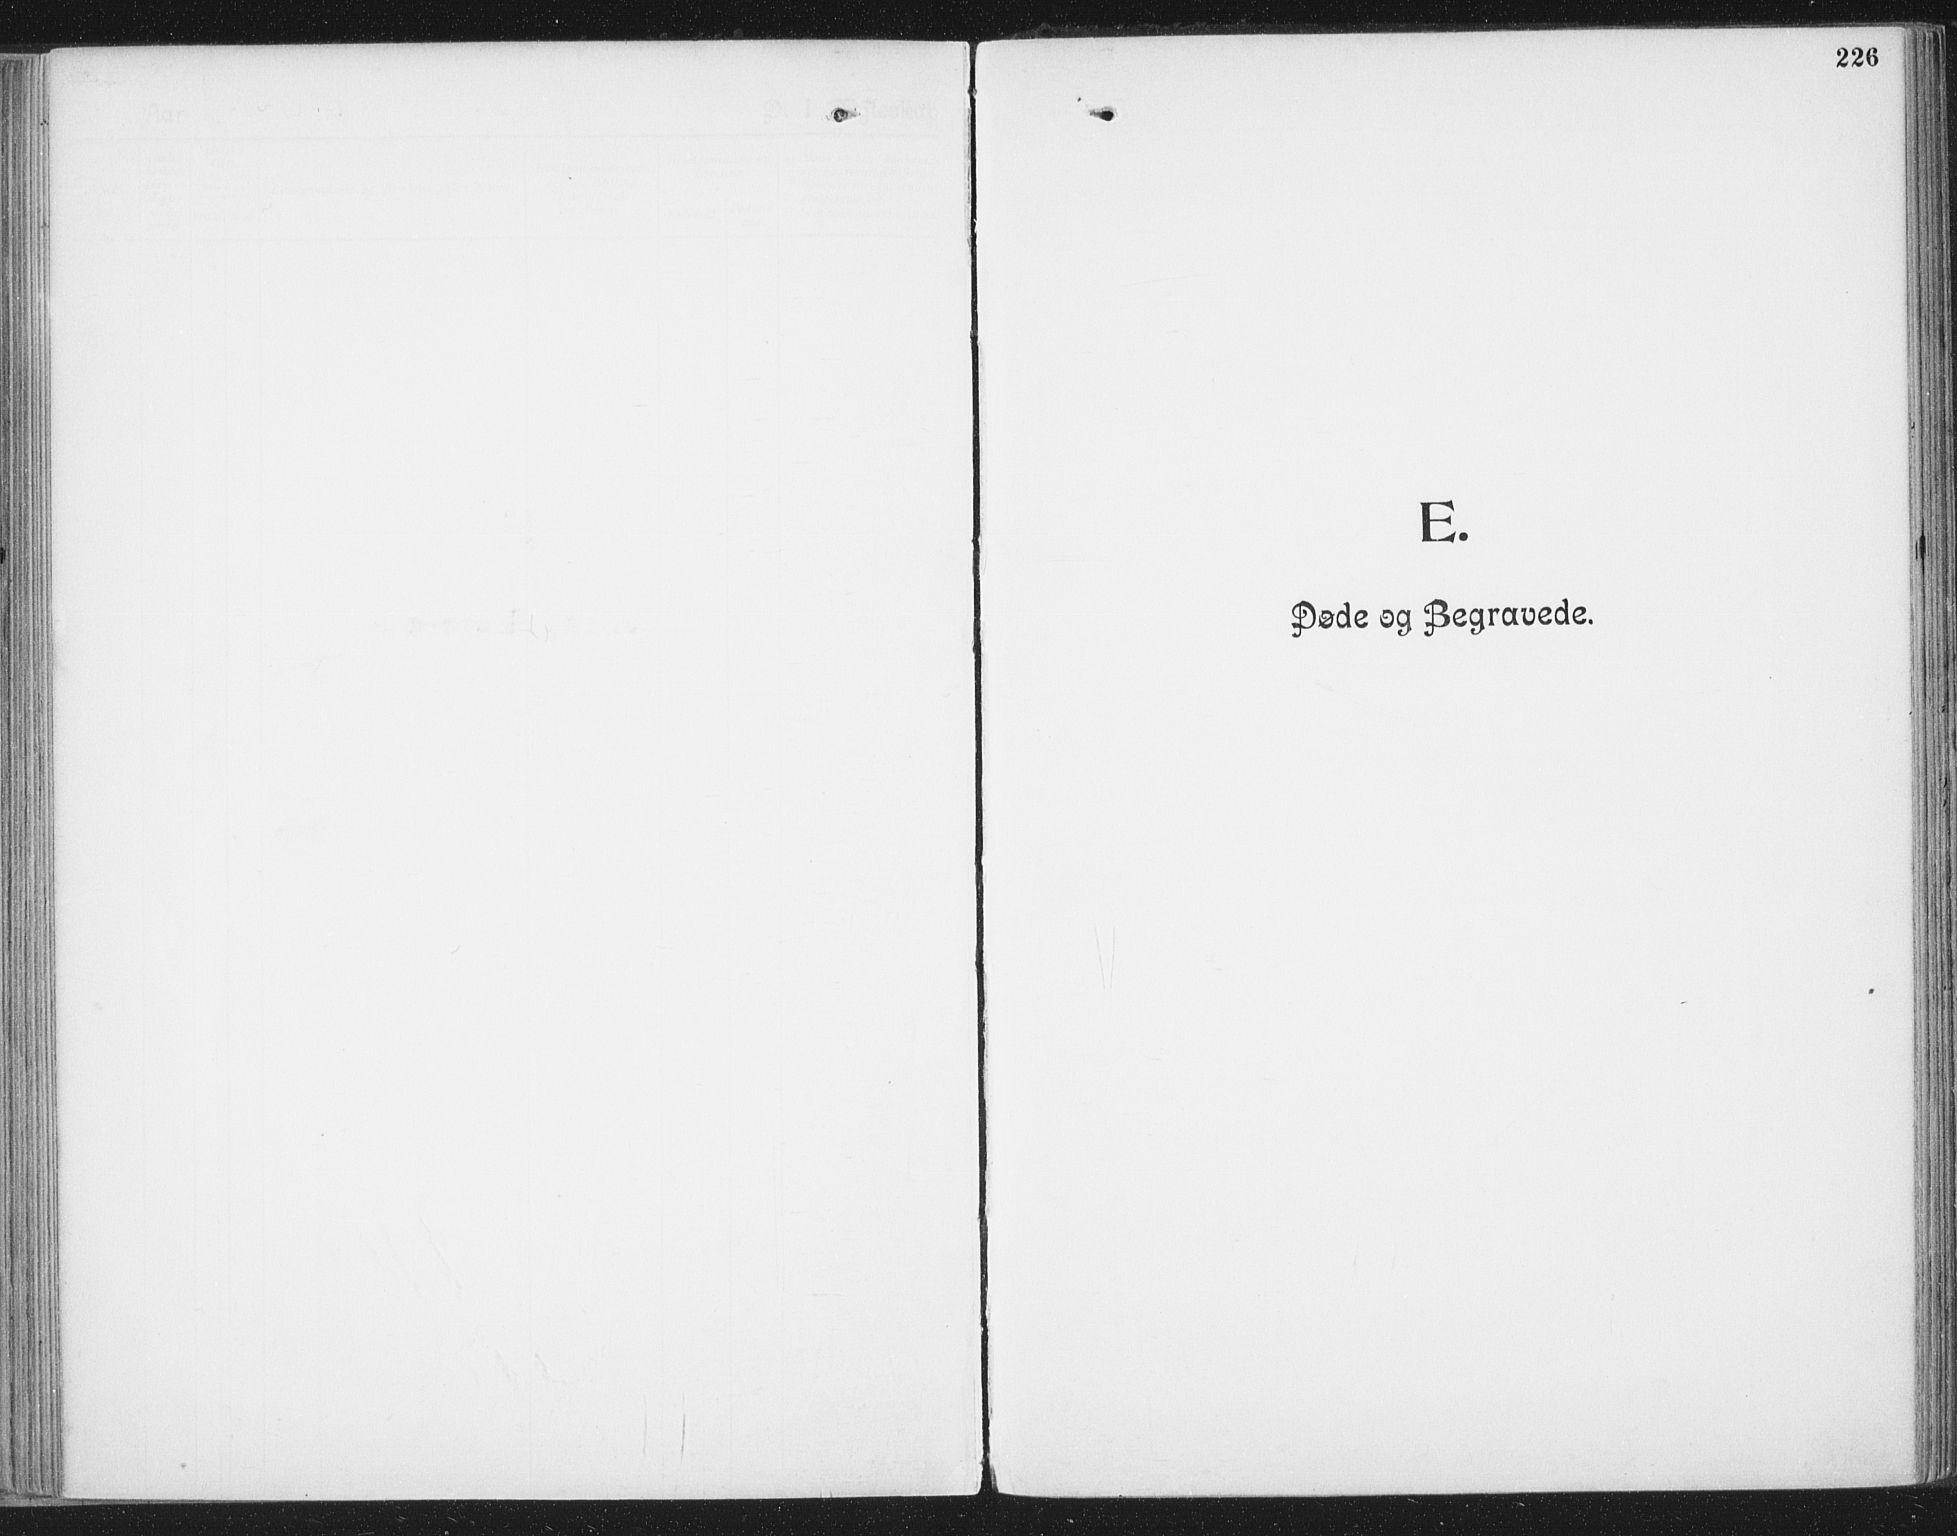 SAT, Ministerialprotokoller, klokkerbøker og fødselsregistre - Nordland, 804/L0081: Ministerialbok nr. 804A02, 1901-1915, s. 226